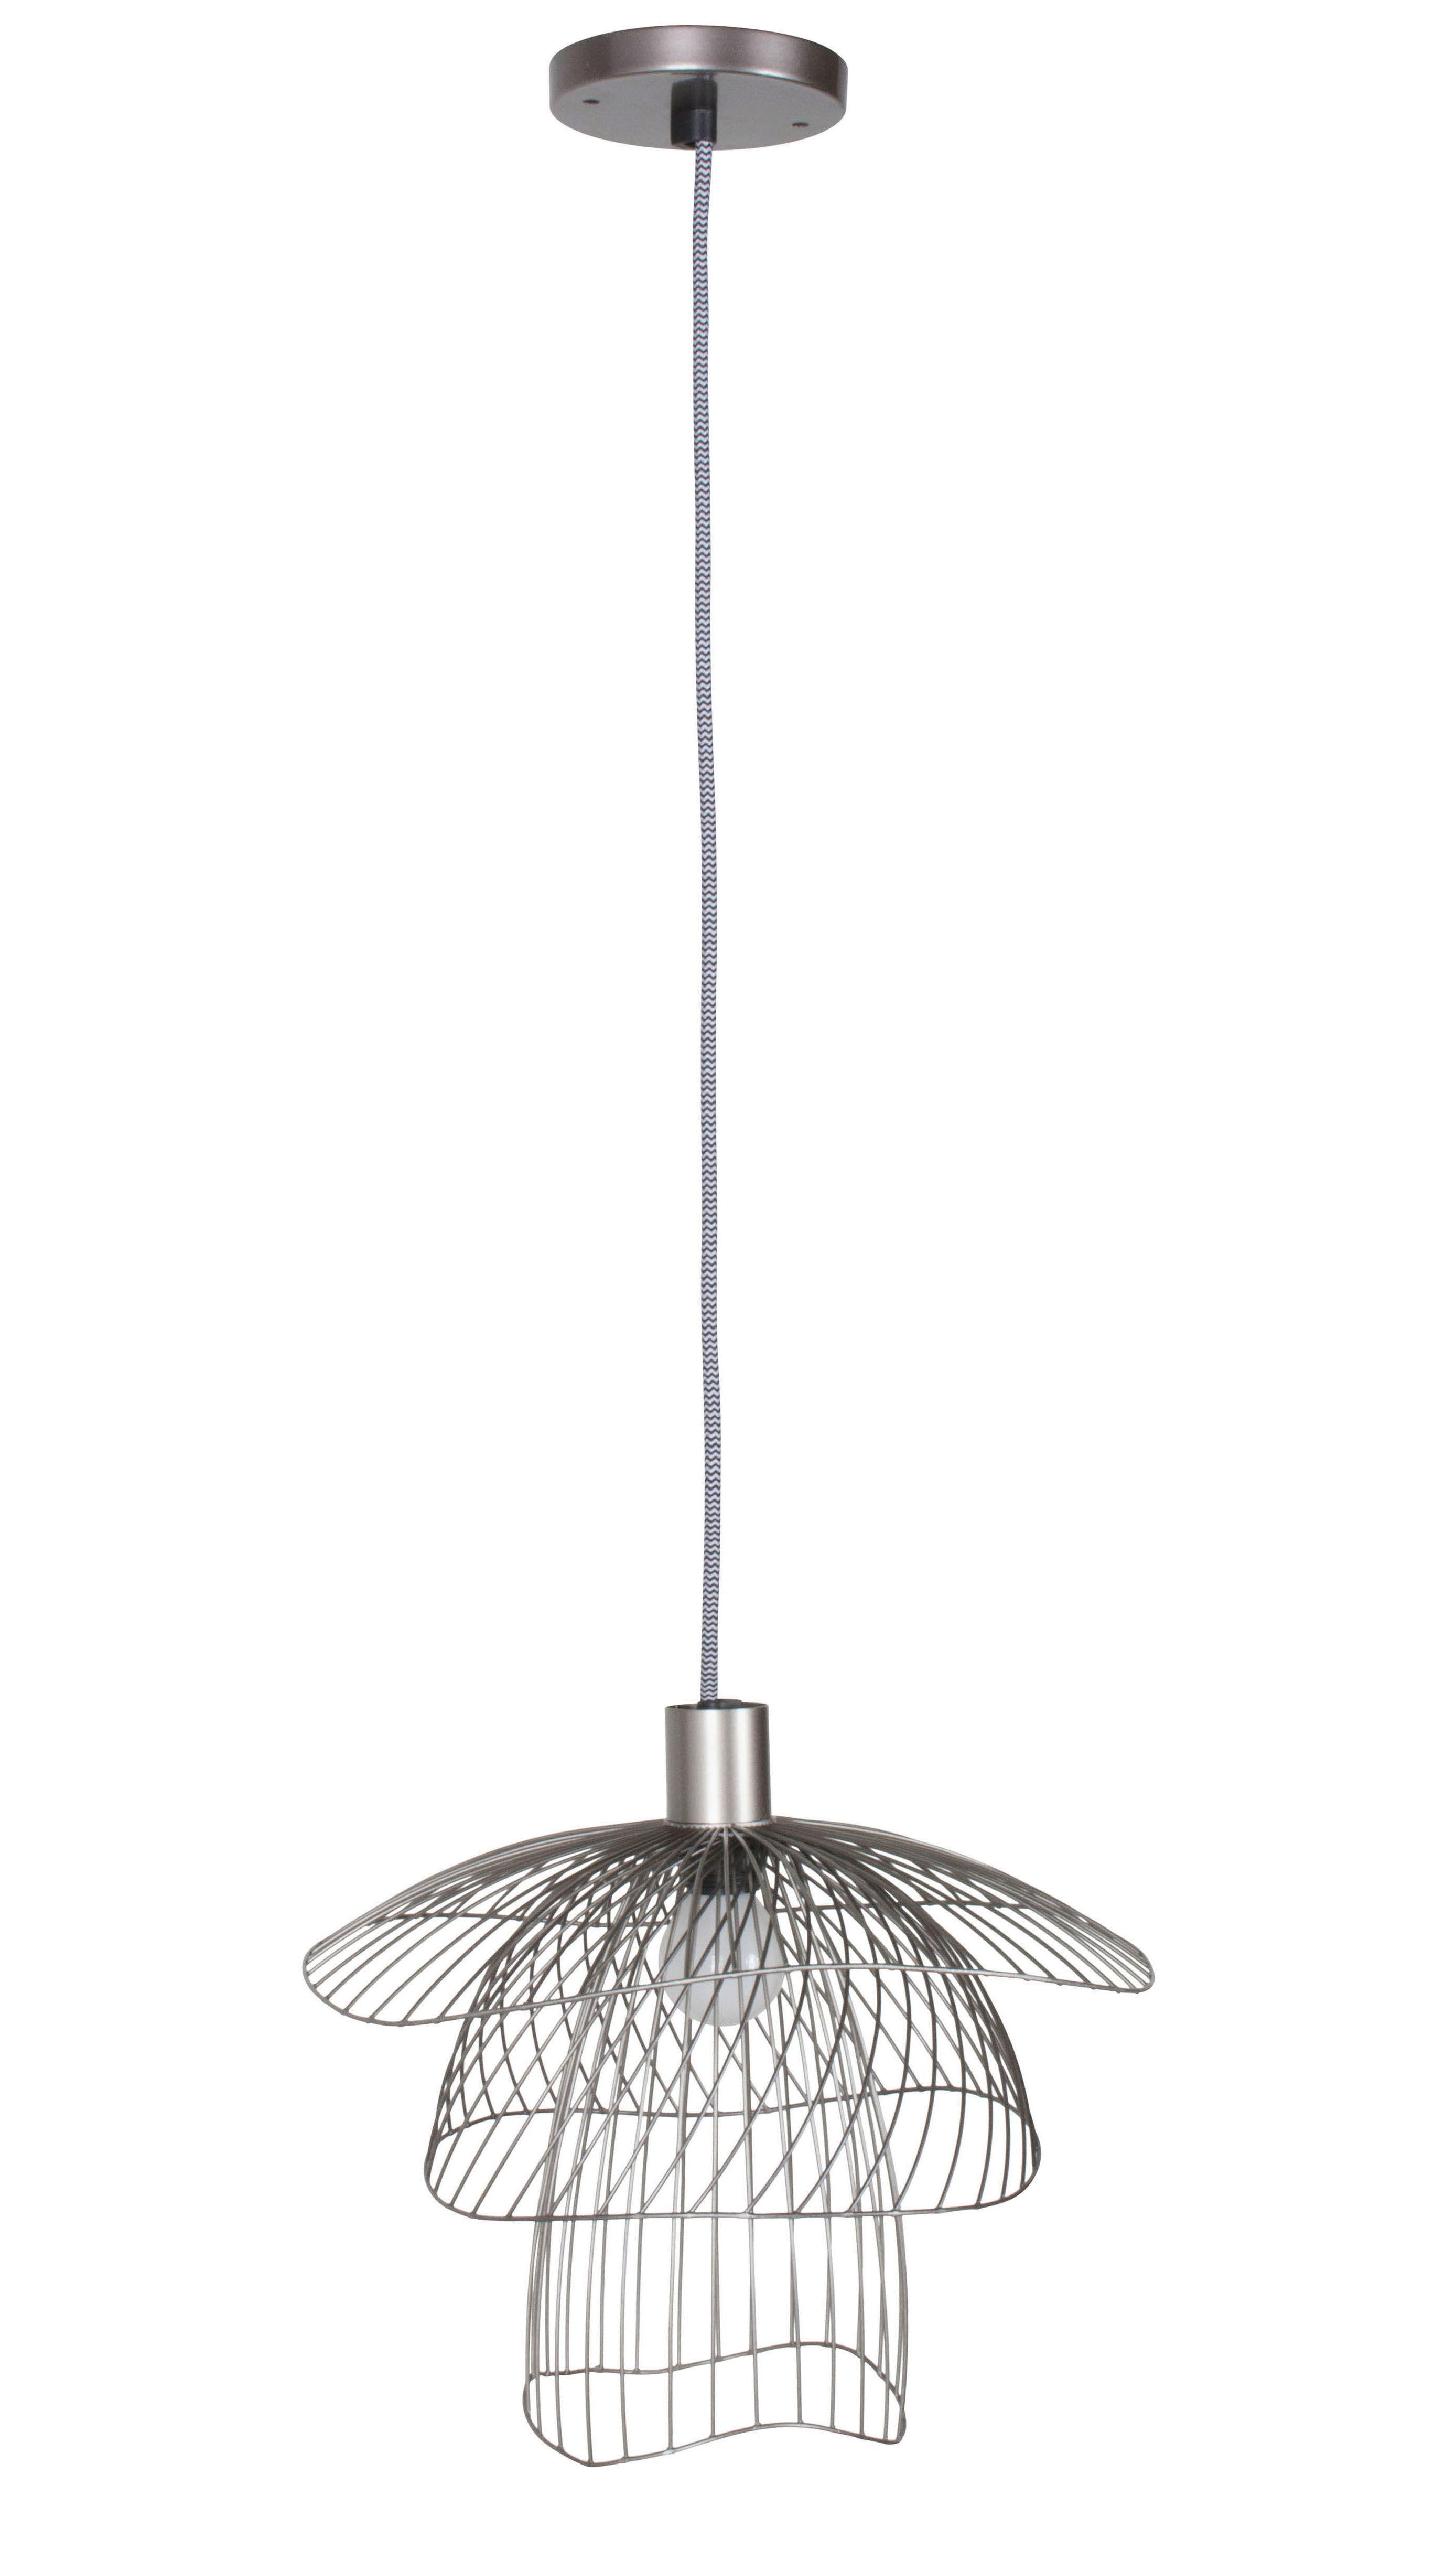 suspension papillon xs 30 cm cuivre rose forestier made in design. Black Bedroom Furniture Sets. Home Design Ideas